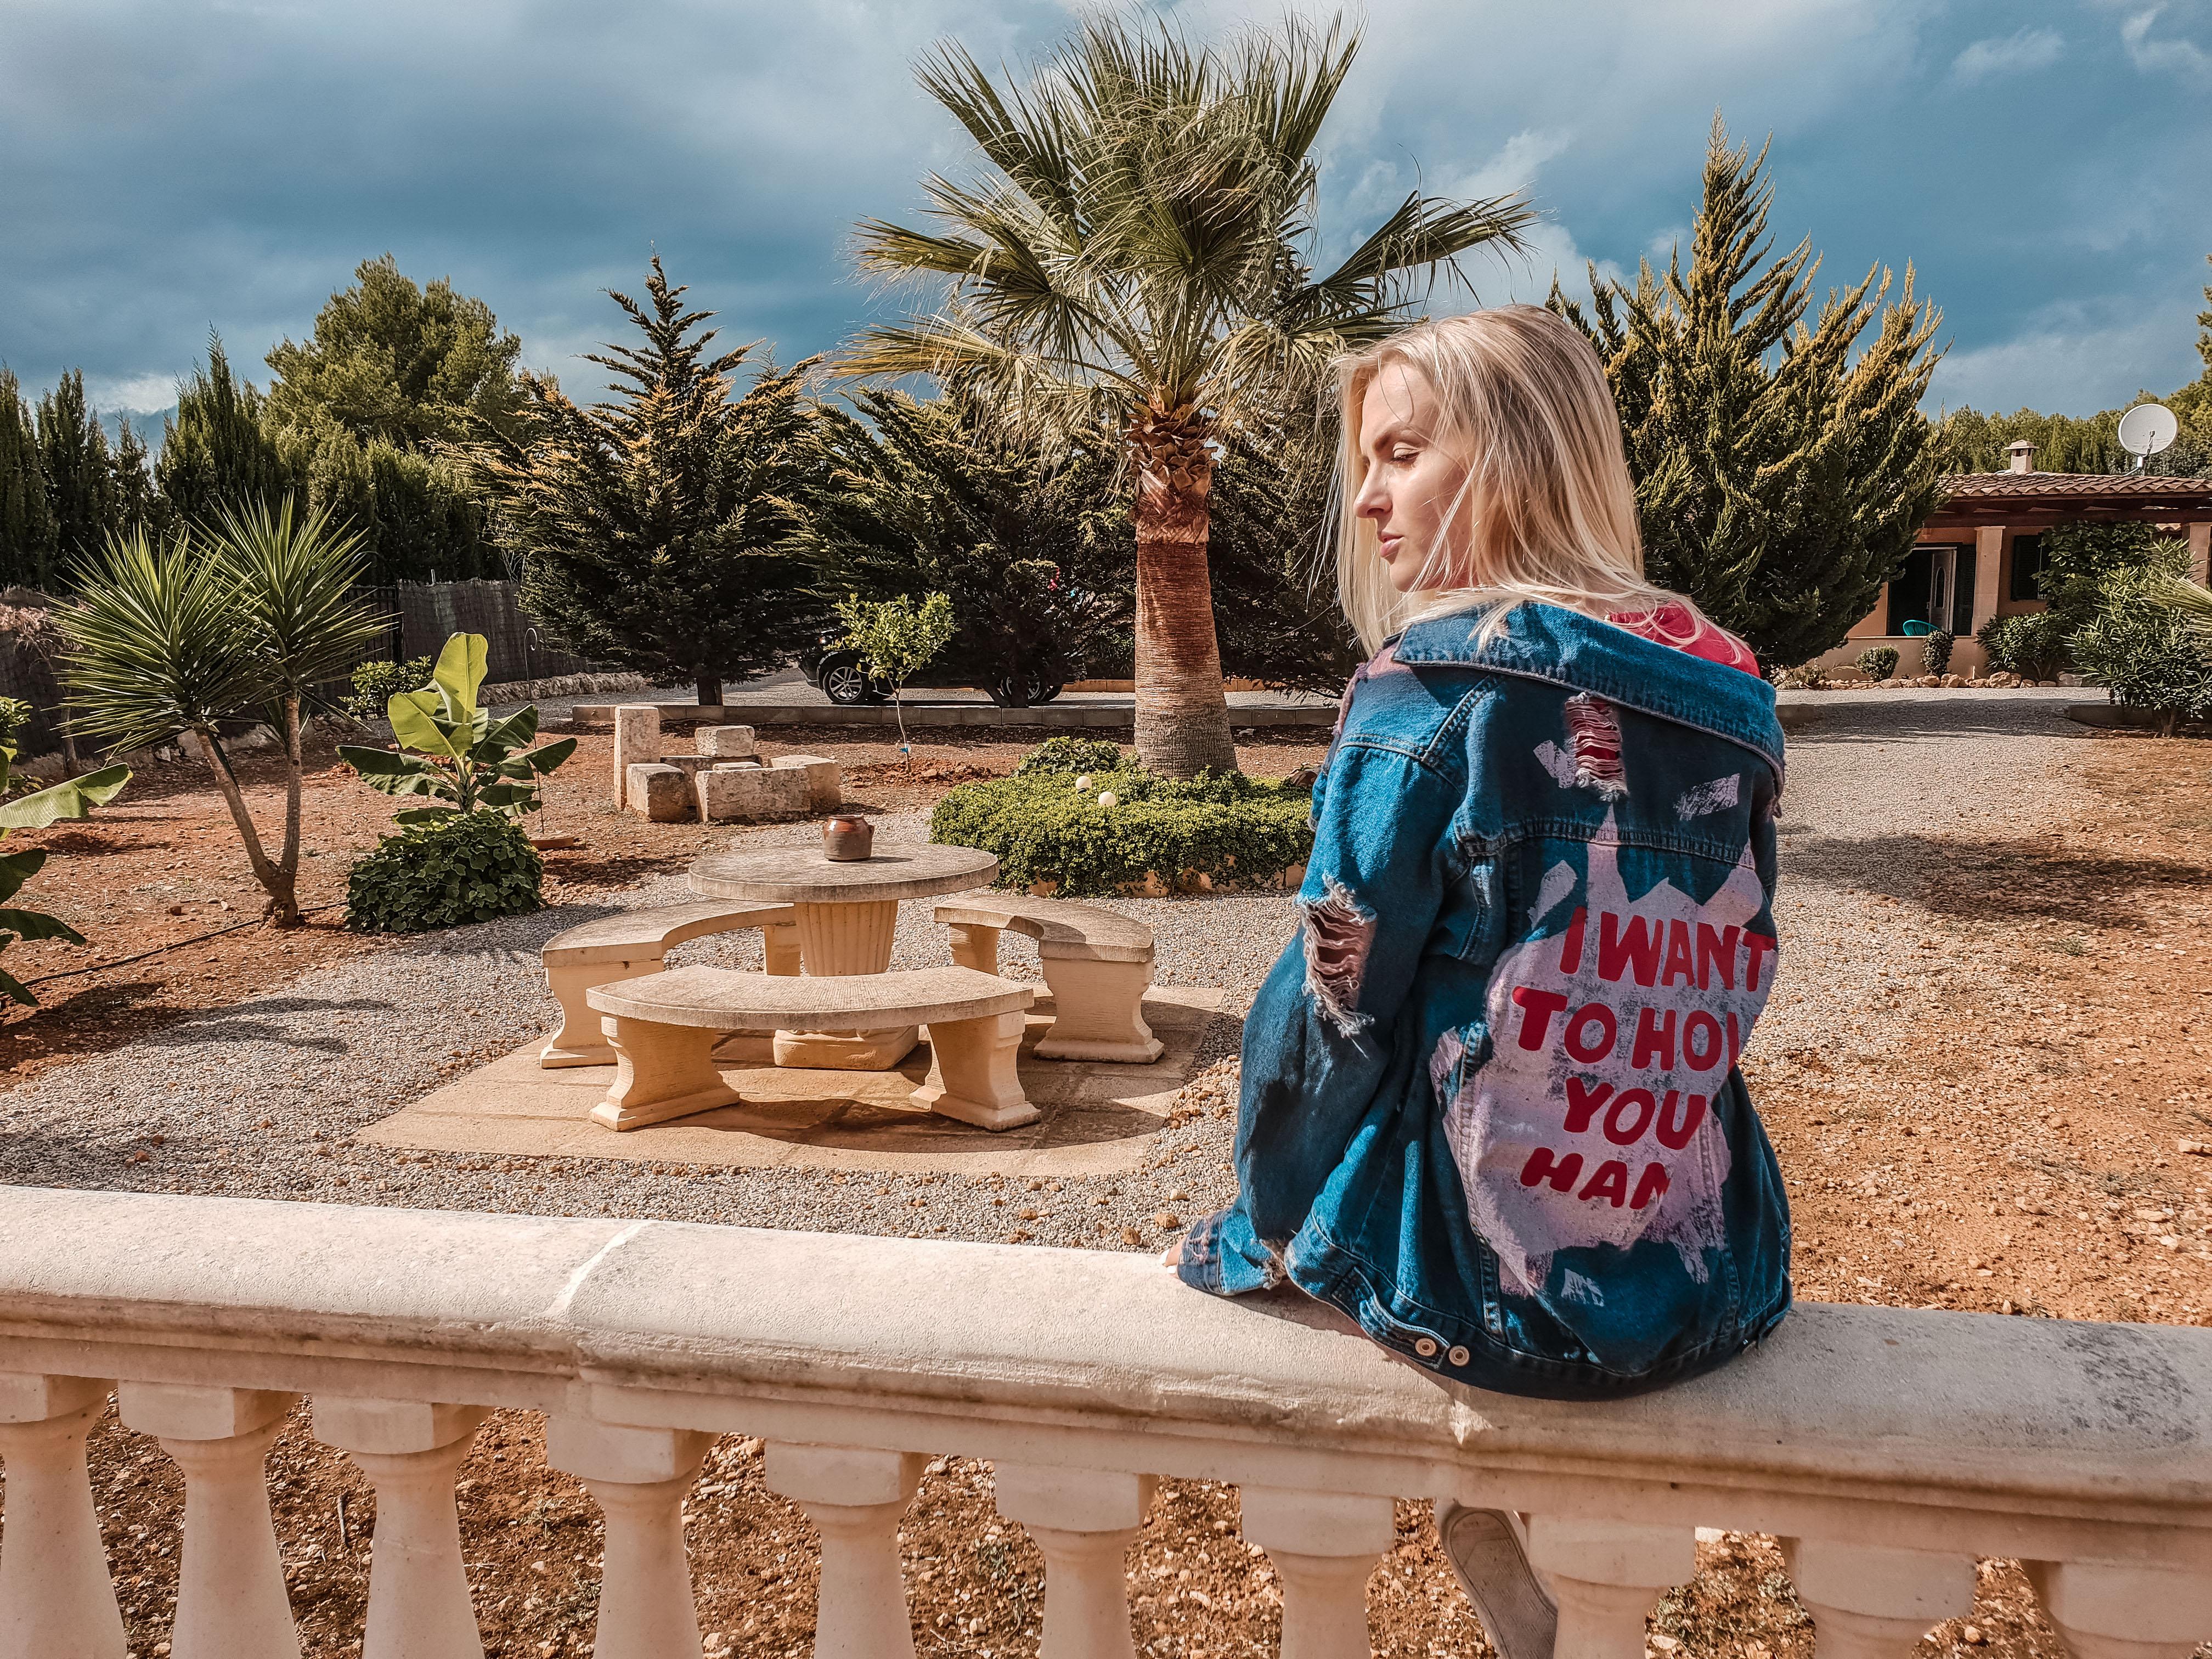 Jeans Jacken Trends 2018, Jeansjacke, Denim Jacket, München, Fashionblog, Modeblog, München, Denim Outfit, Kleid rot, Oversize, Print, Katefully, Blog